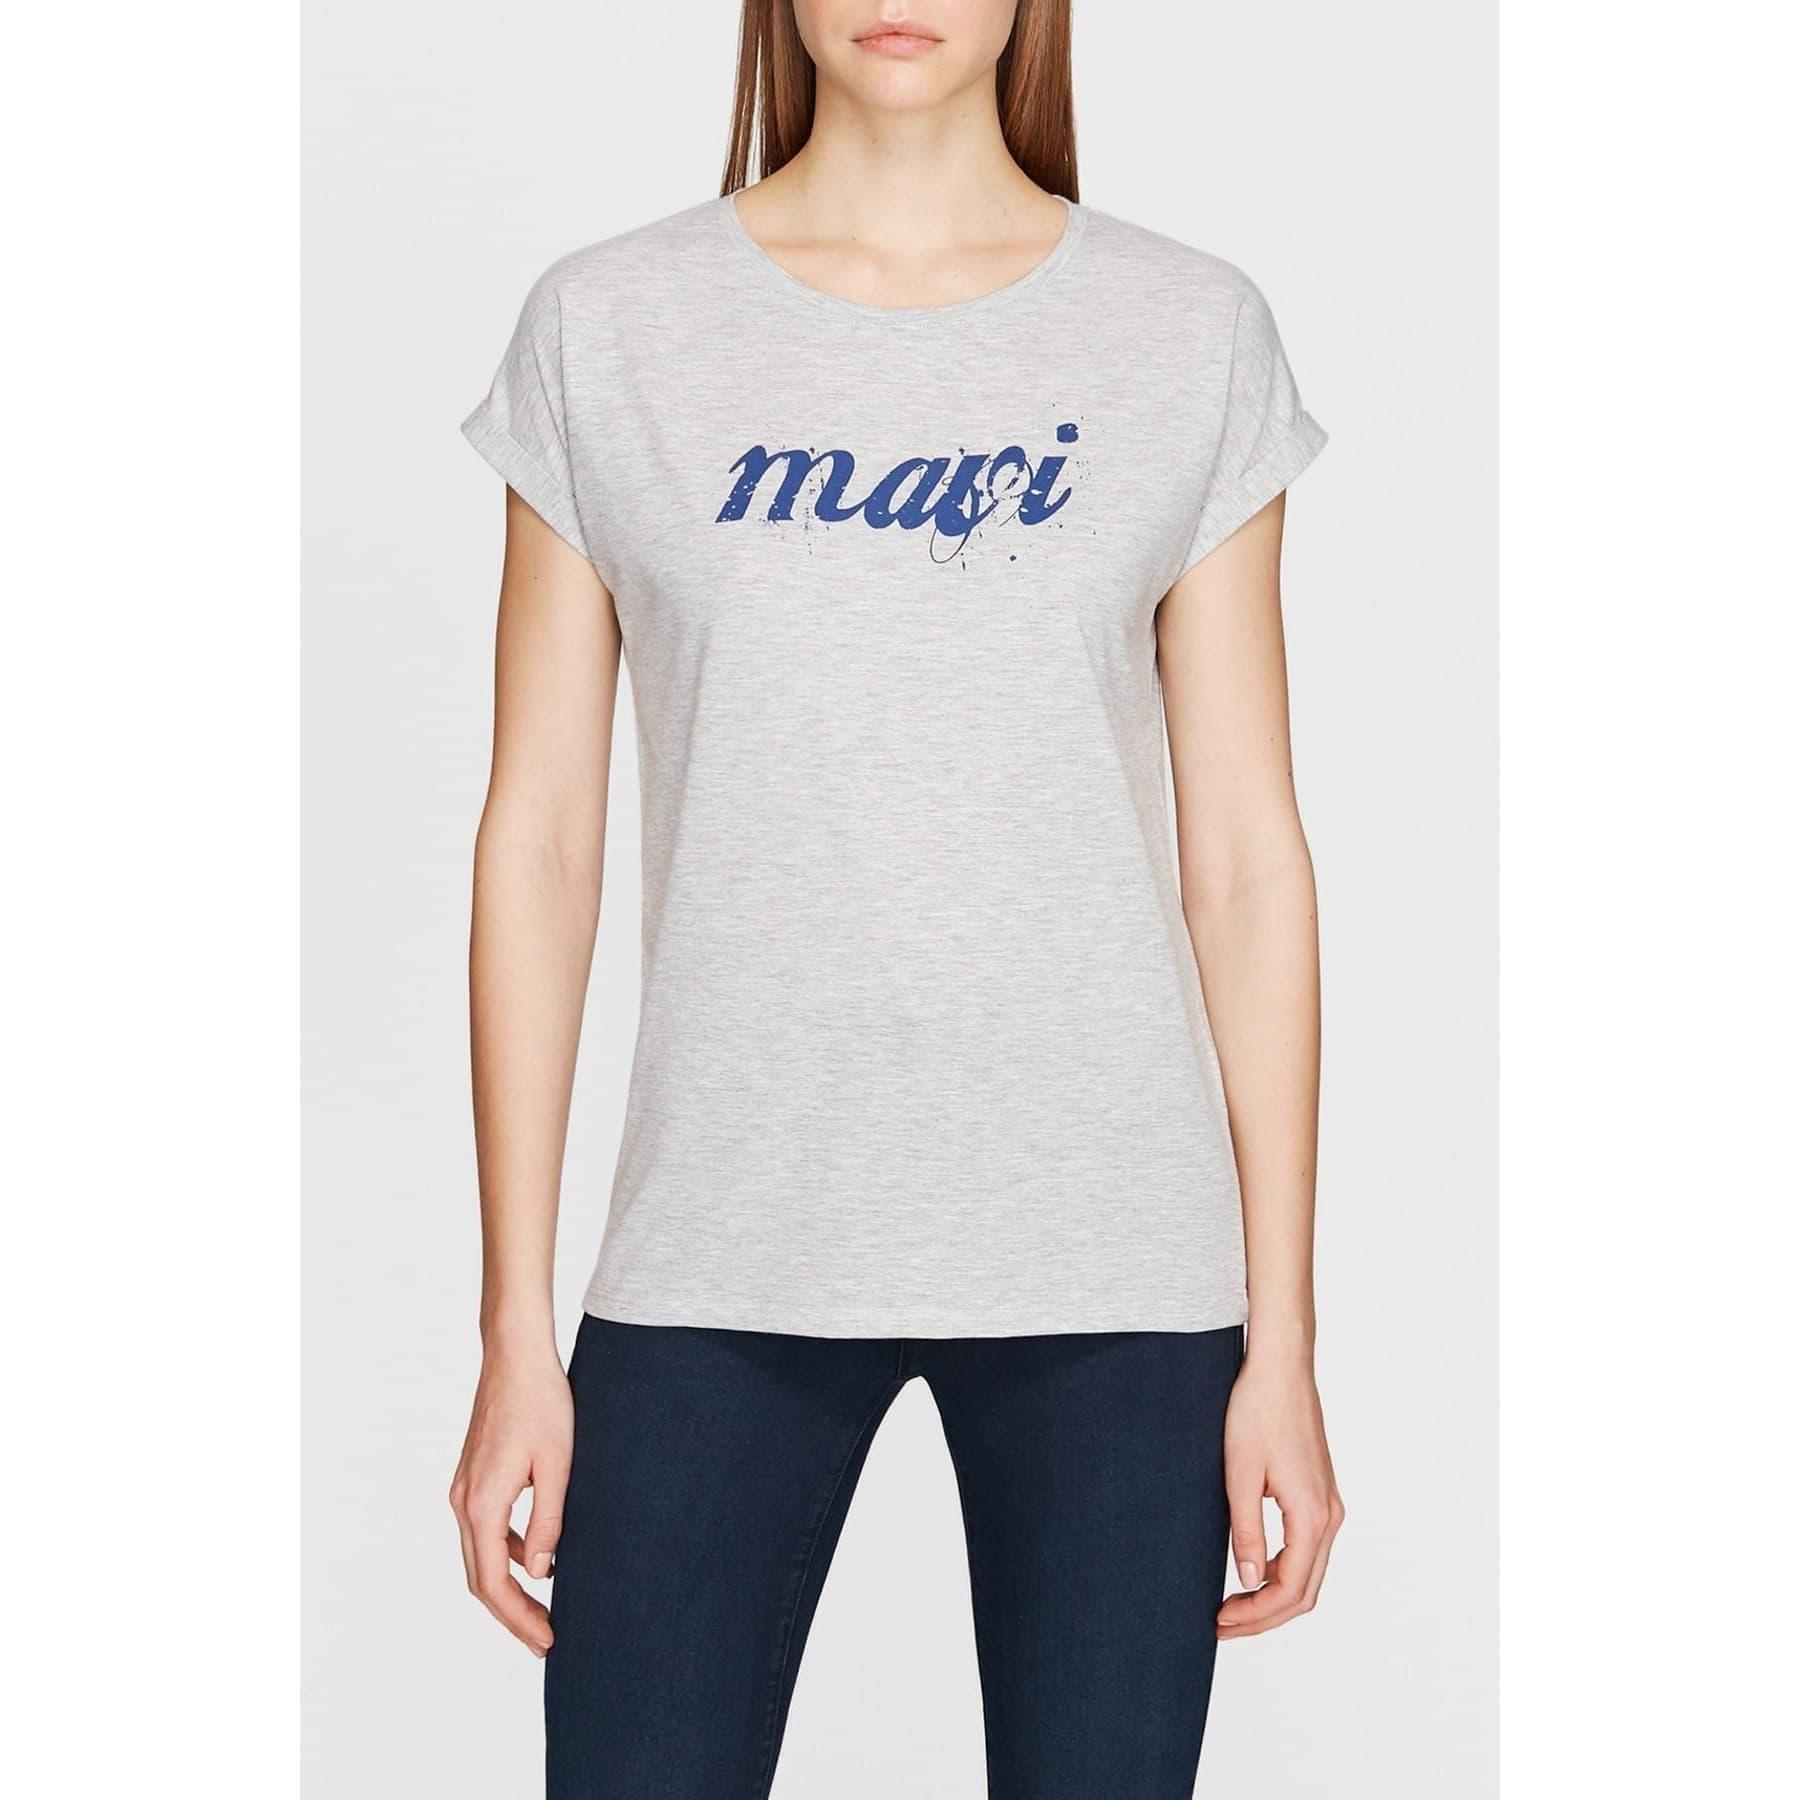 Mavi Logo Istanbul Tisört Gri Melanj